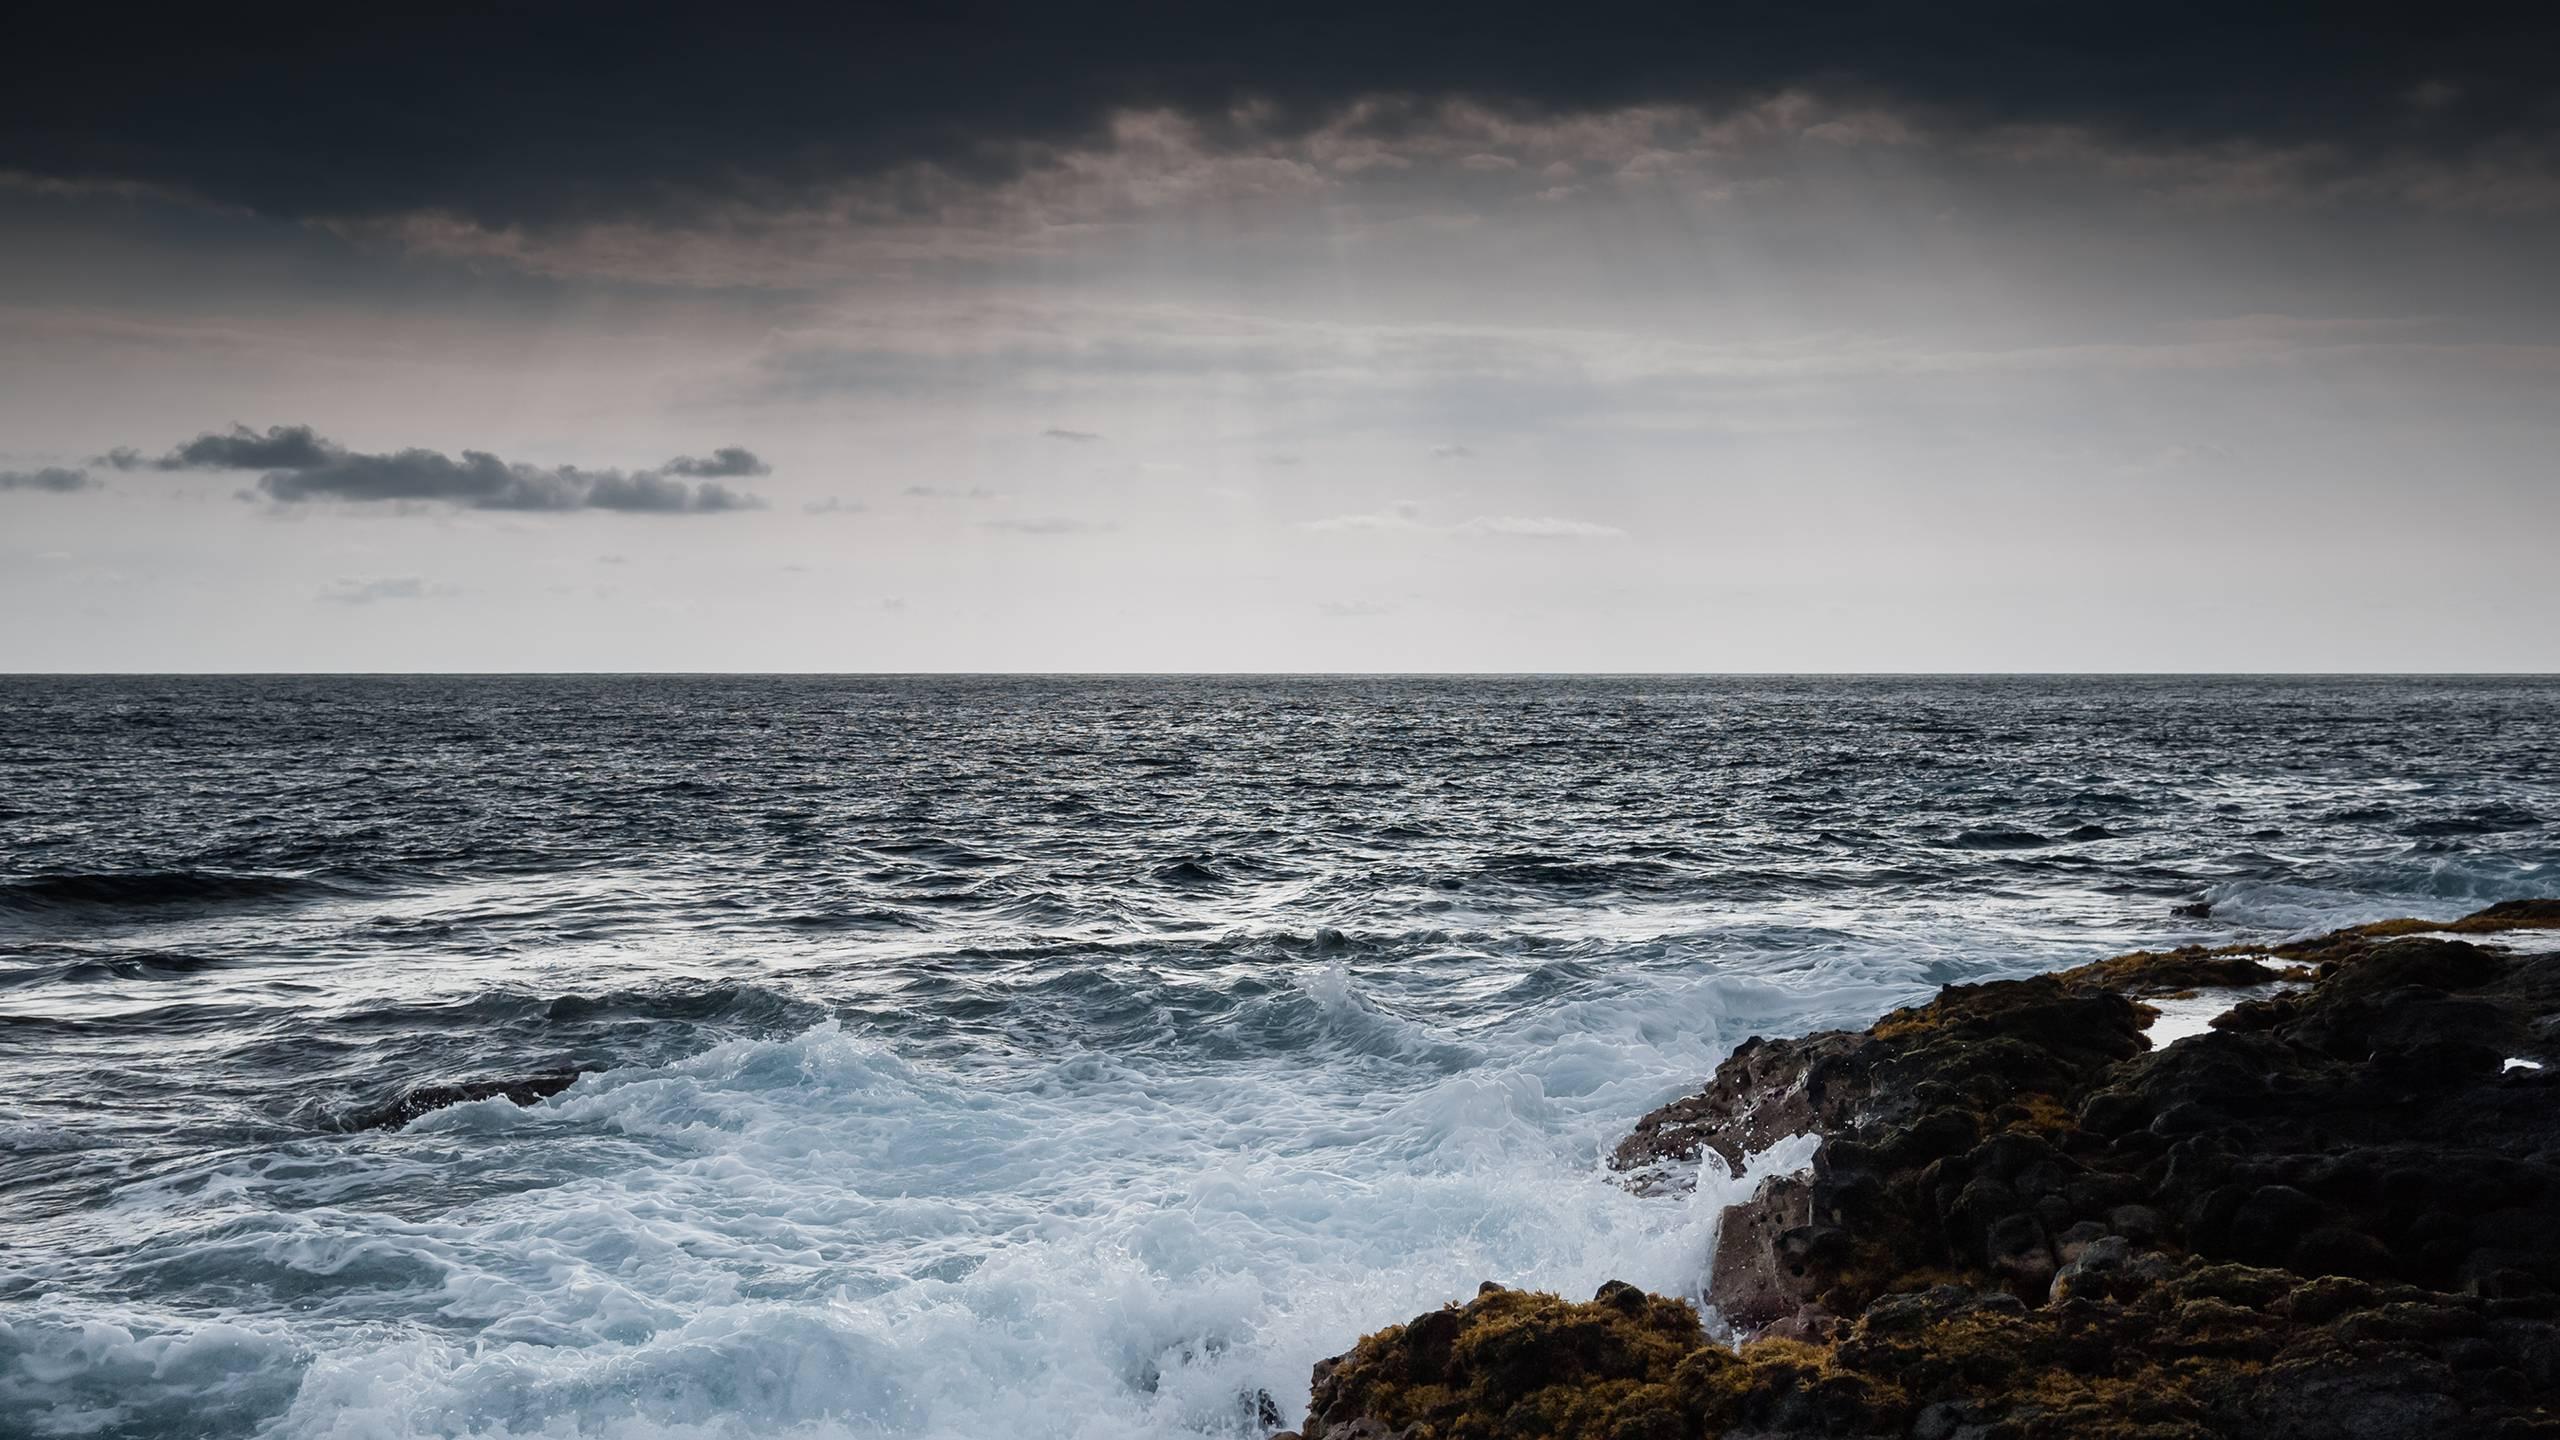 Stormy Ocean Wallpapers - Wallpaper Cave